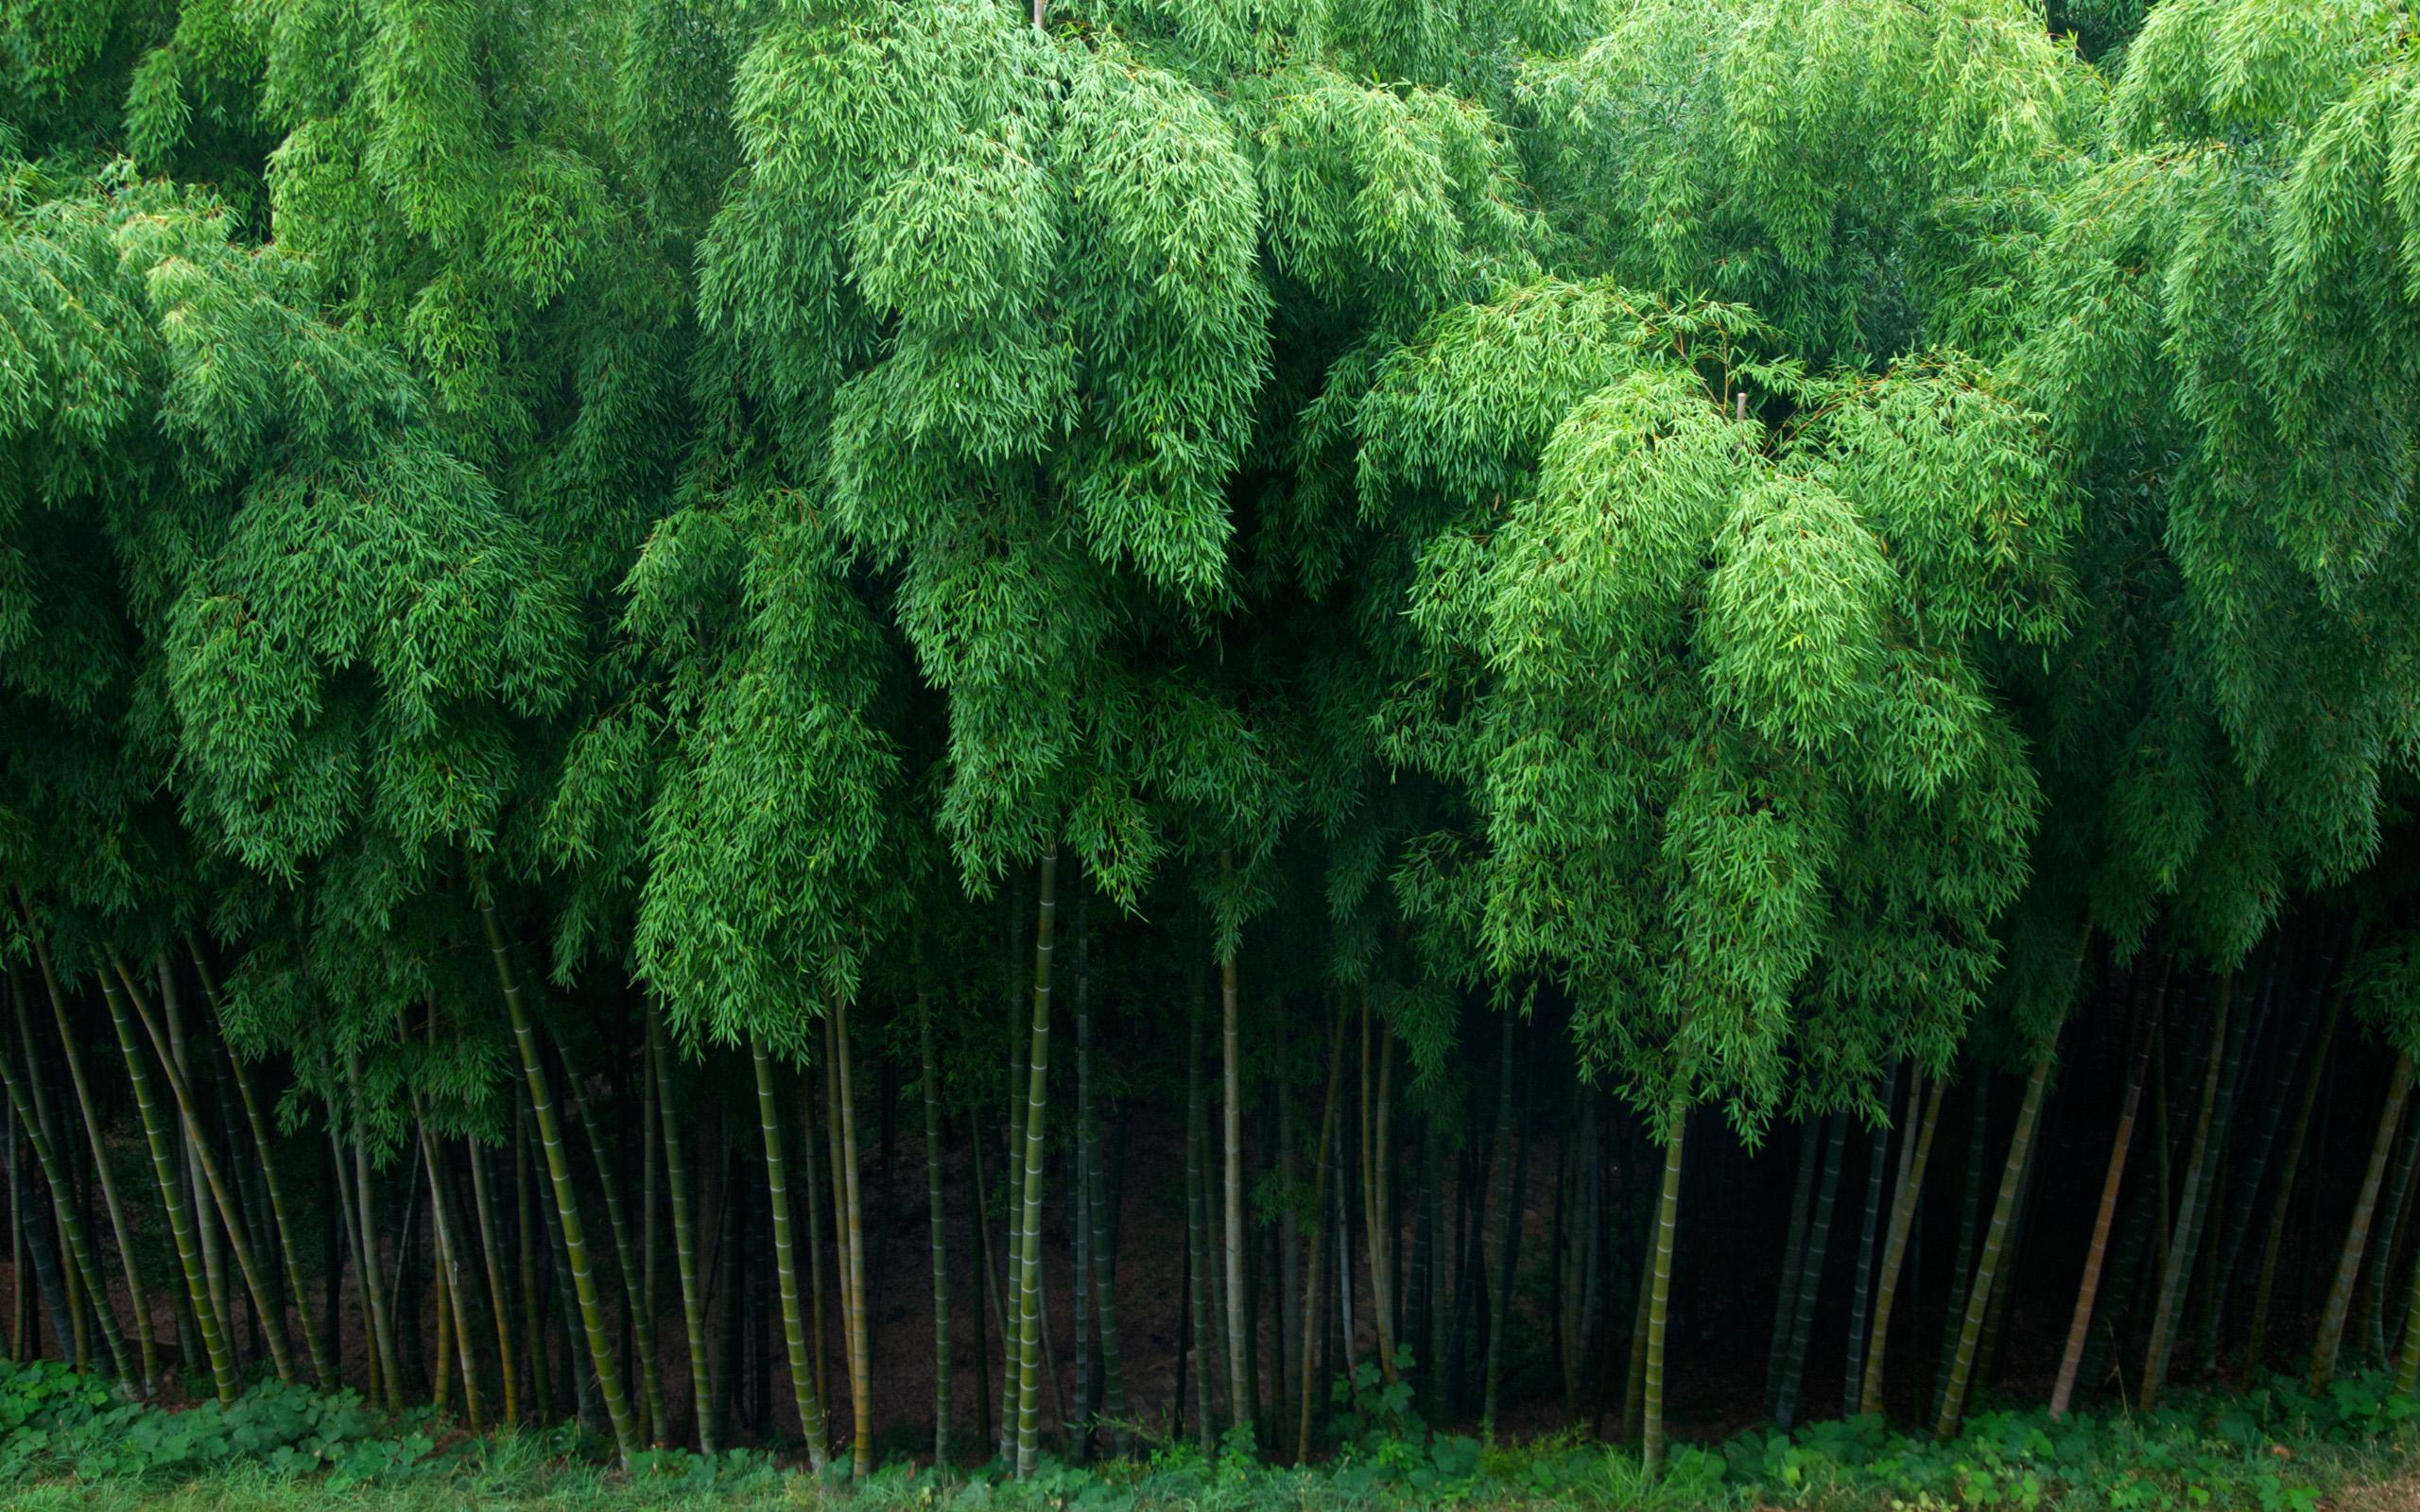 Bamboo Hd Wallpaper Background Image 2560x1600 Id